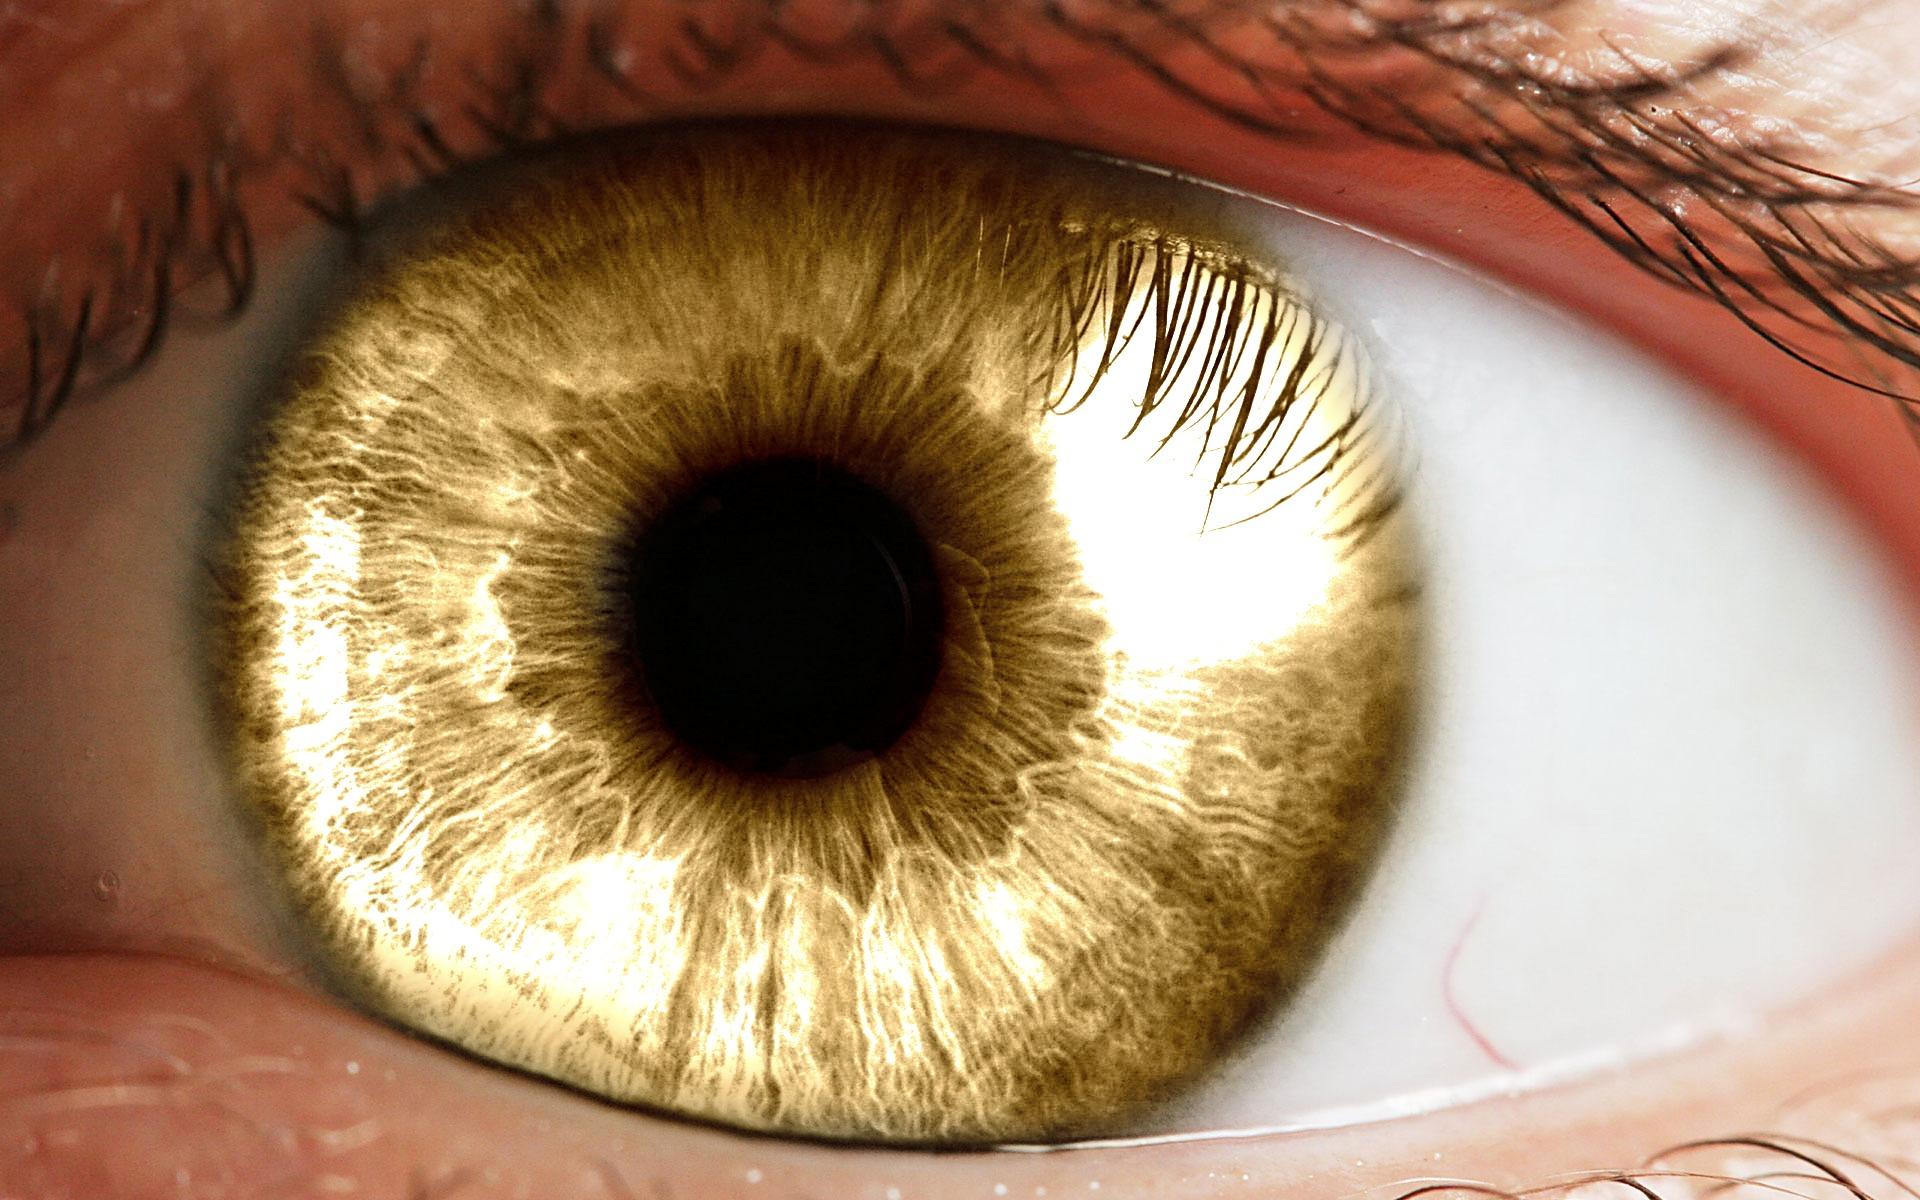 yellow eyes human - photo #24